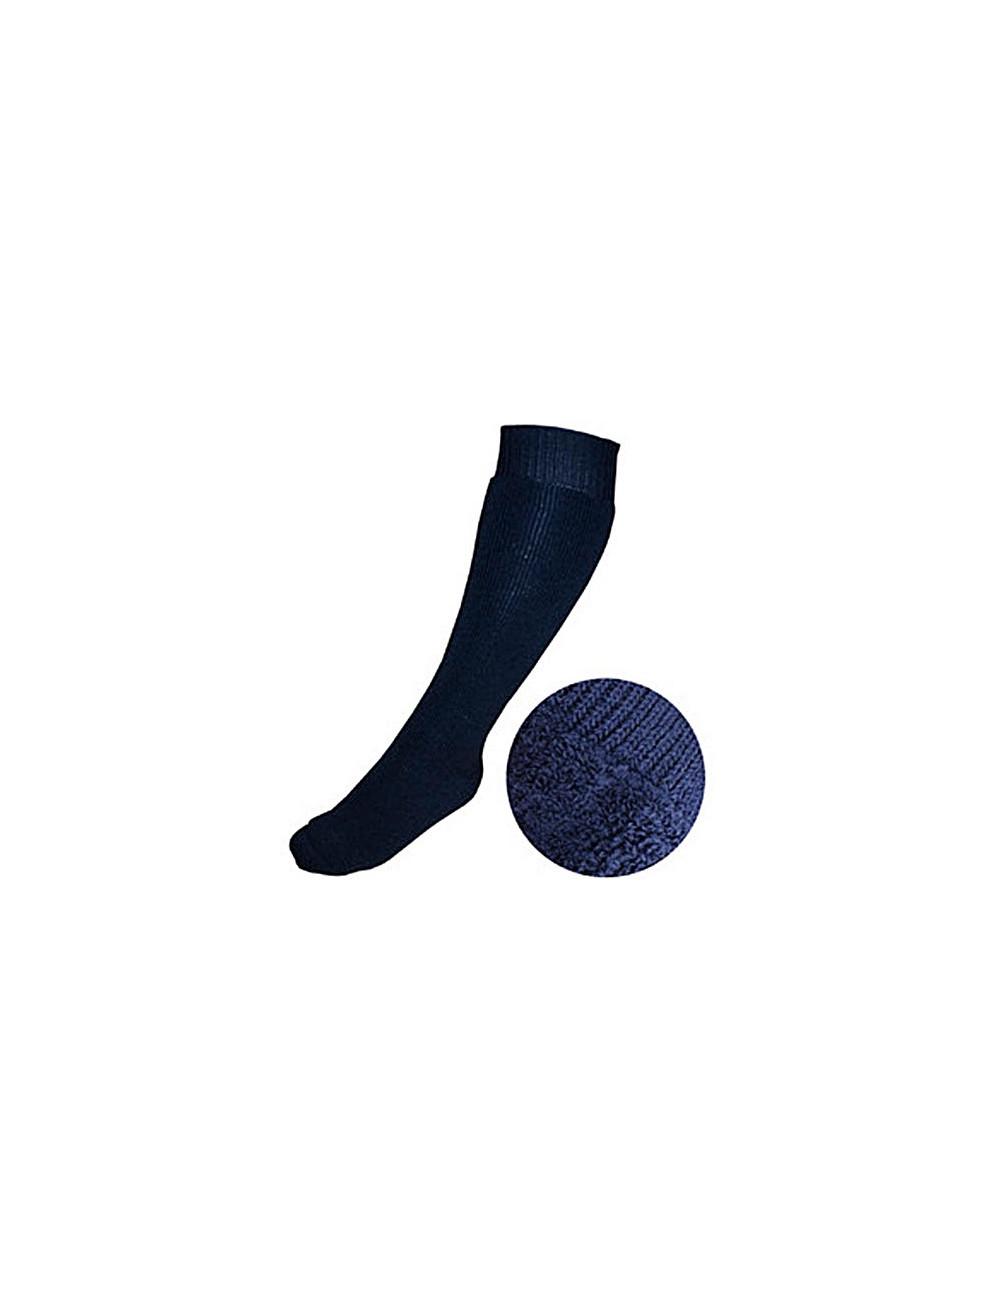 Skarpety wysokie do chłodni i mroźni, Knee length Socks